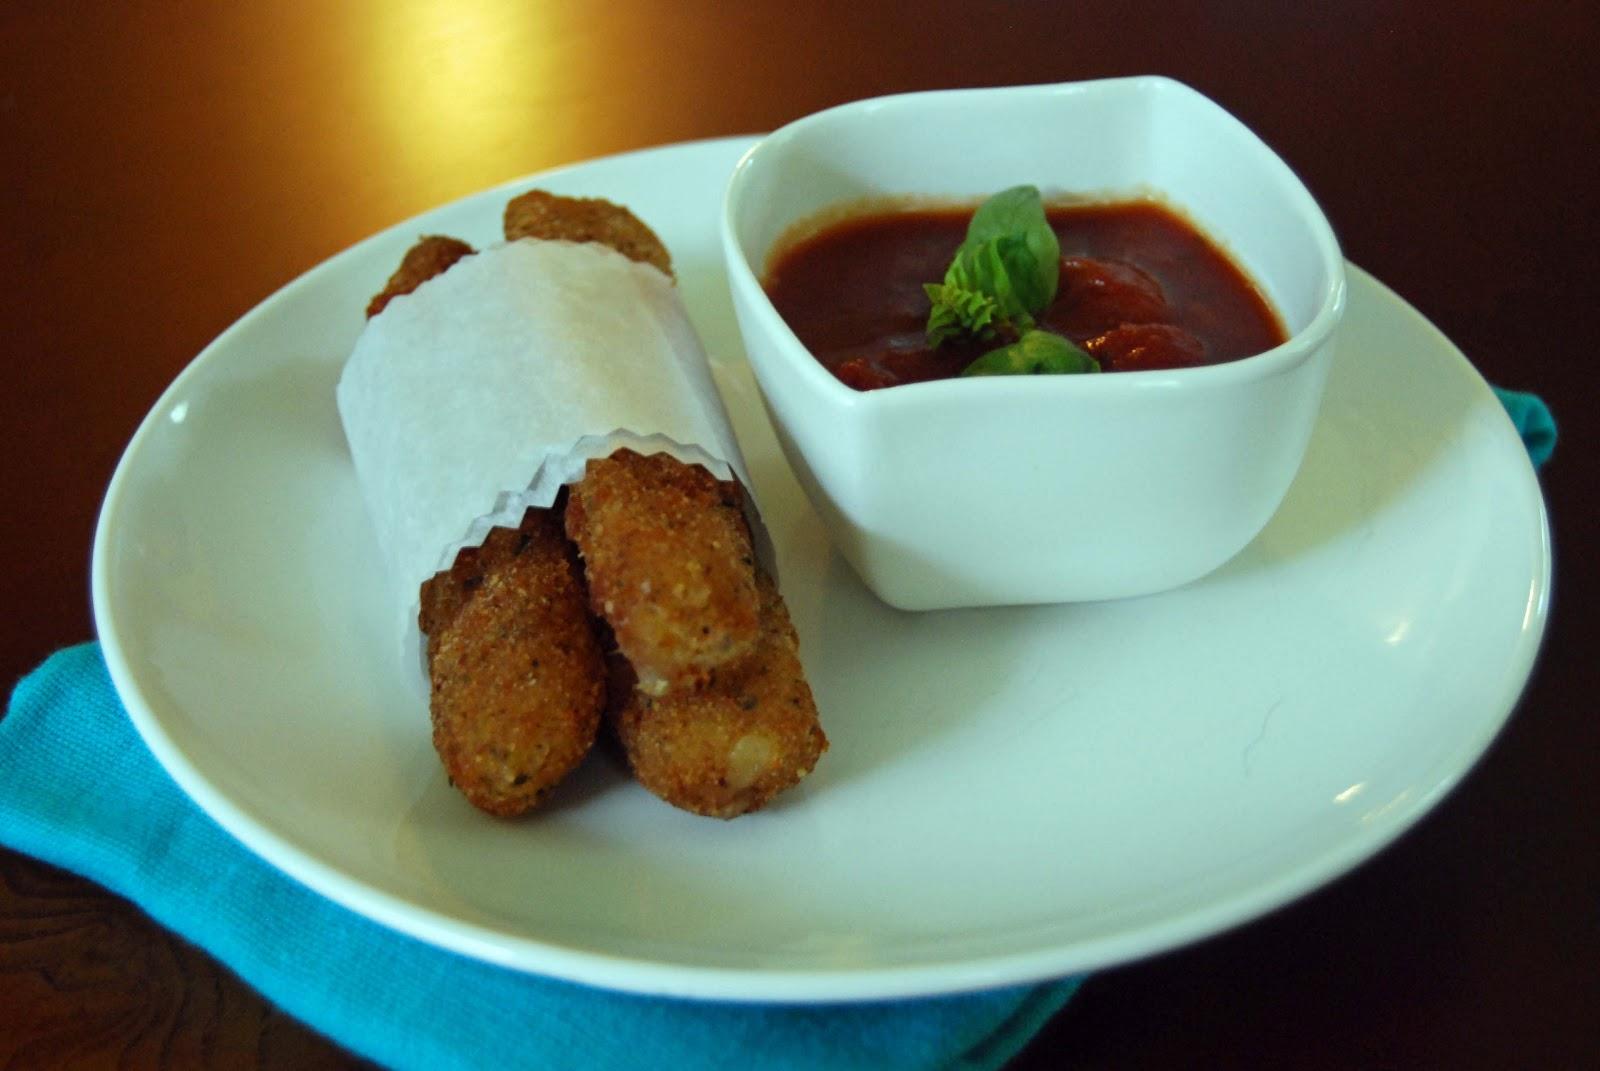 Mozzarella Sticks | by Life Tastes Good are homemade, double breaded ...